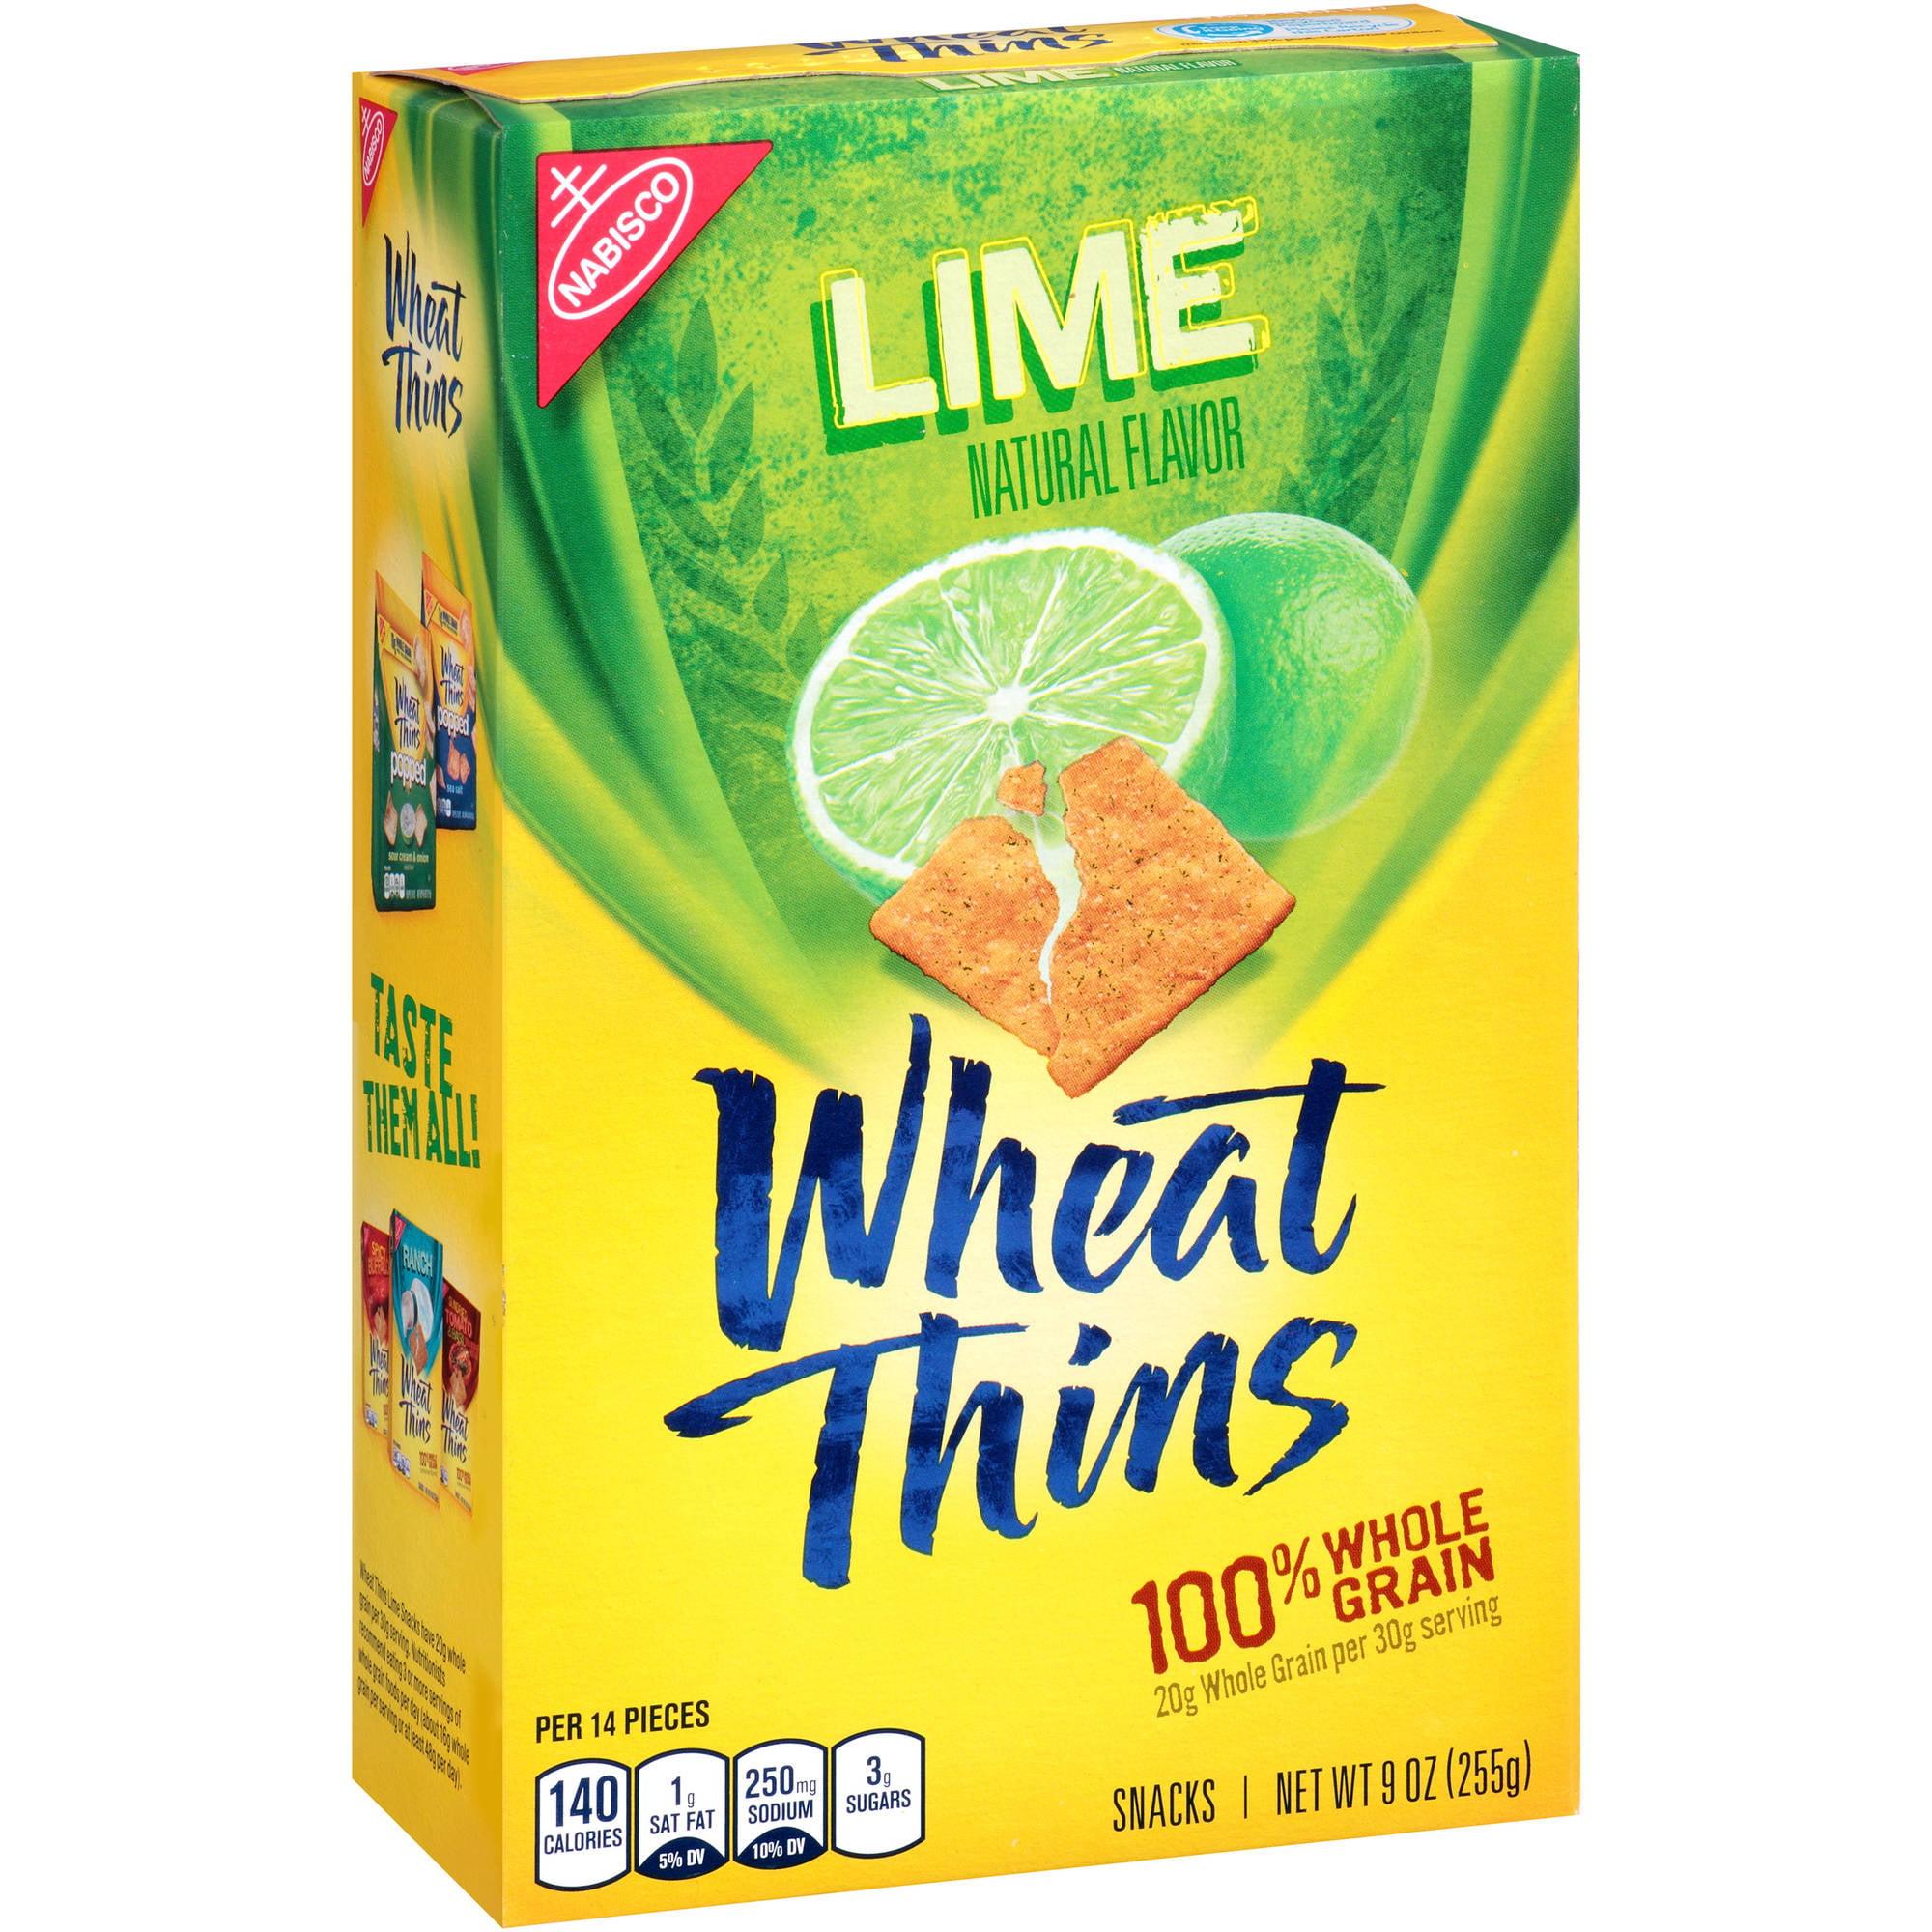 Nabisco Wheat Thins Lime Flavor, 9.0 OZ - Walmart.com | 450 x 450 jpeg 42kB